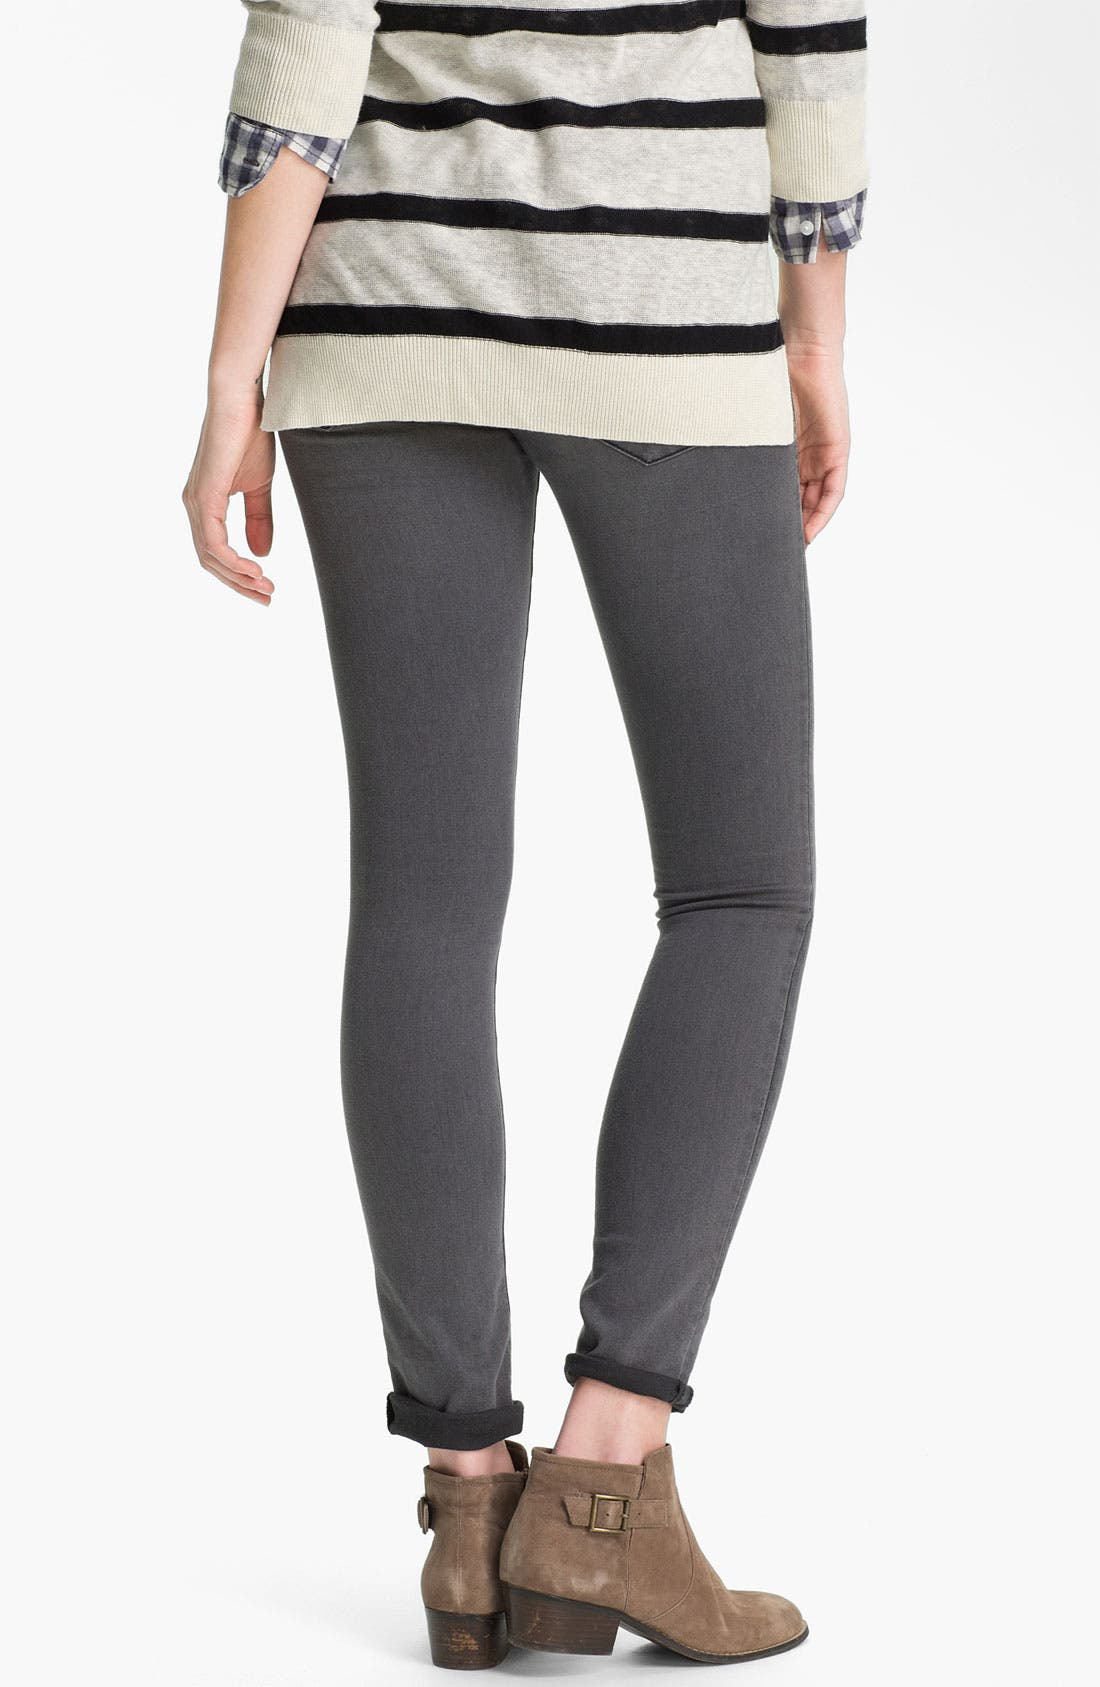 Alternate Image 2  - Articles of Society 'Mya' Skinny Jeans (Greyson) (Juniors)